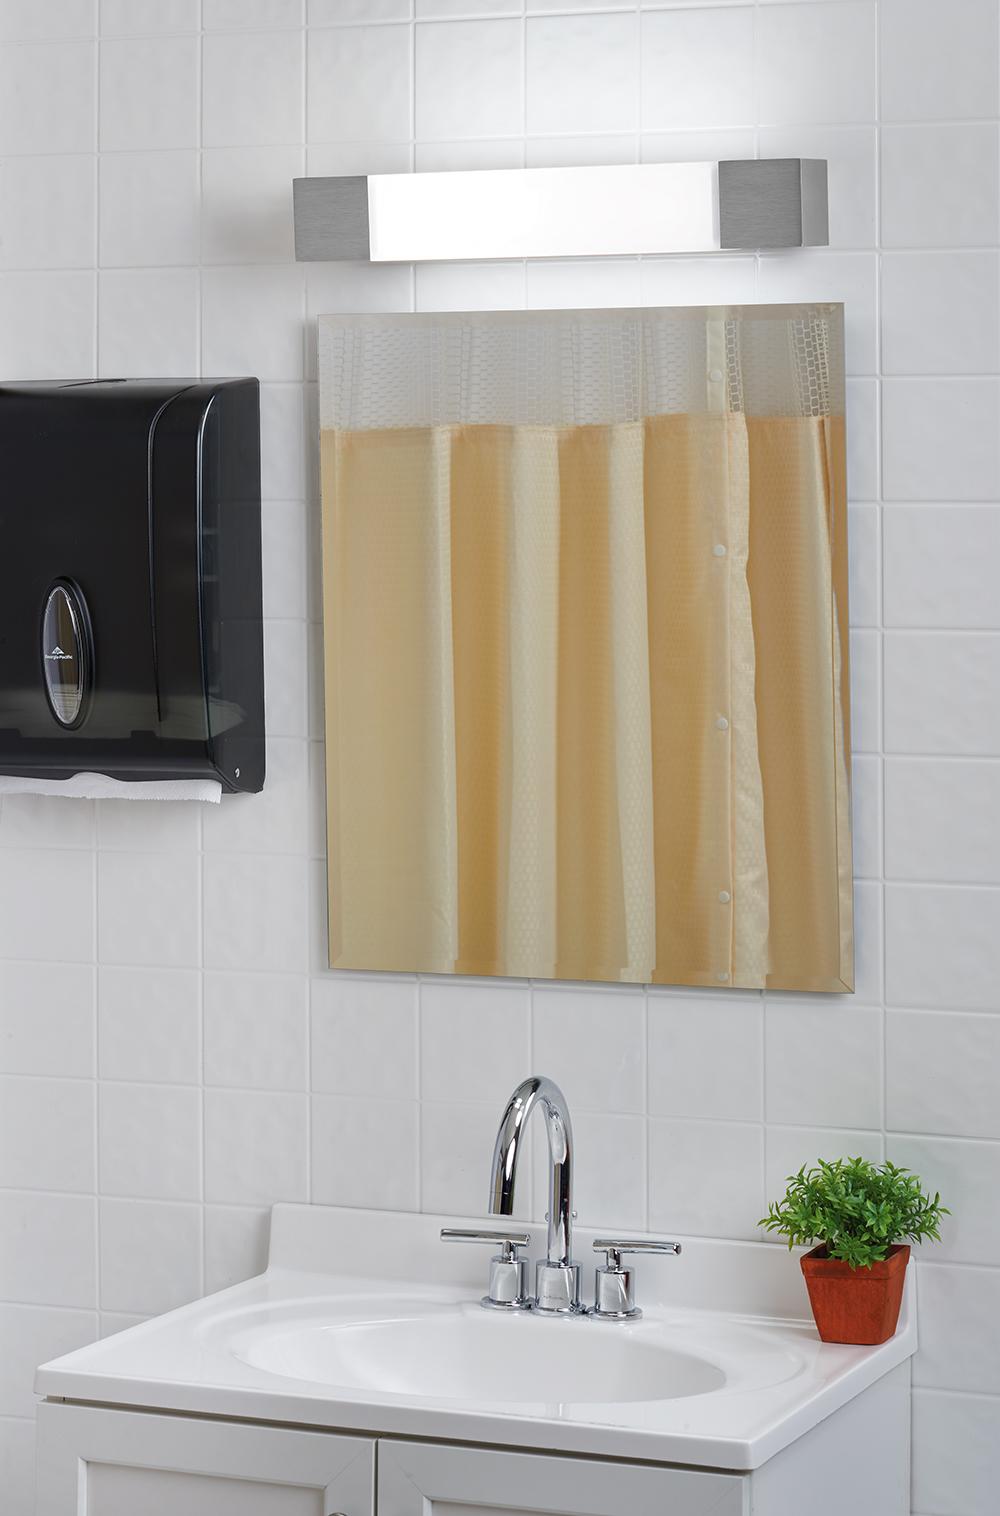 Shine modern vanity light fixture mounted horizontally over a minimalist mirror and vanity for modern apartment lighting design.